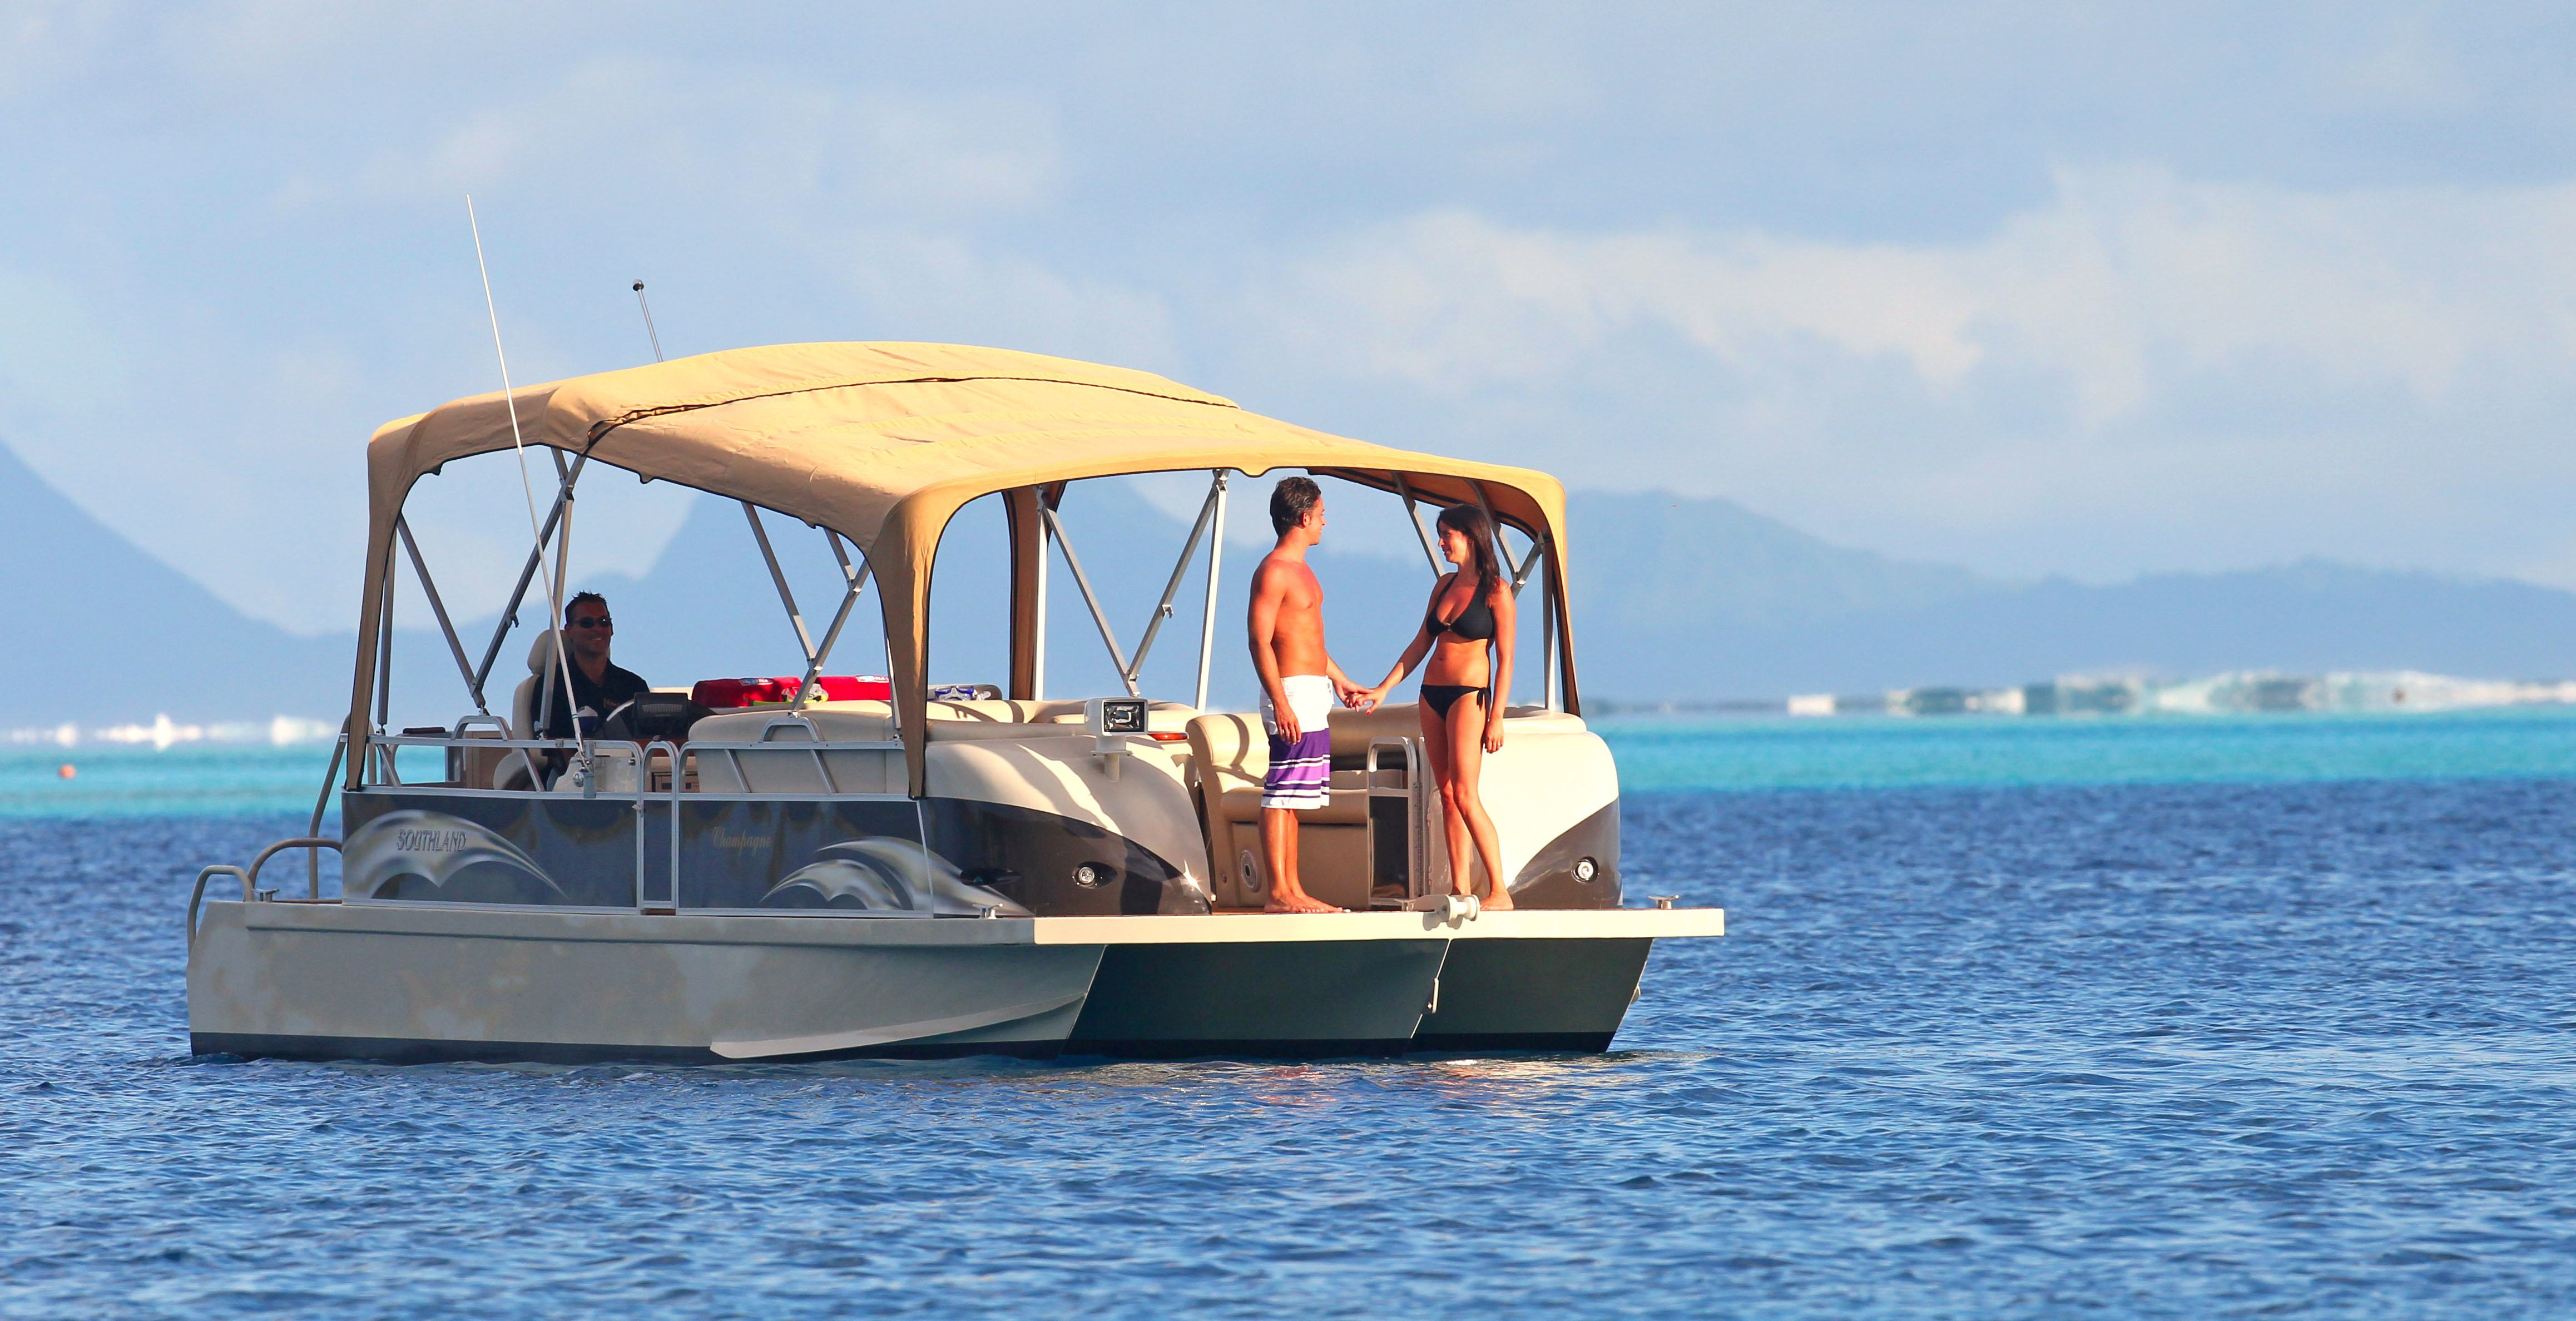 https://tahititourisme.mx/wp-content/uploads/2017/08/Champagne-Boat-2.jpg